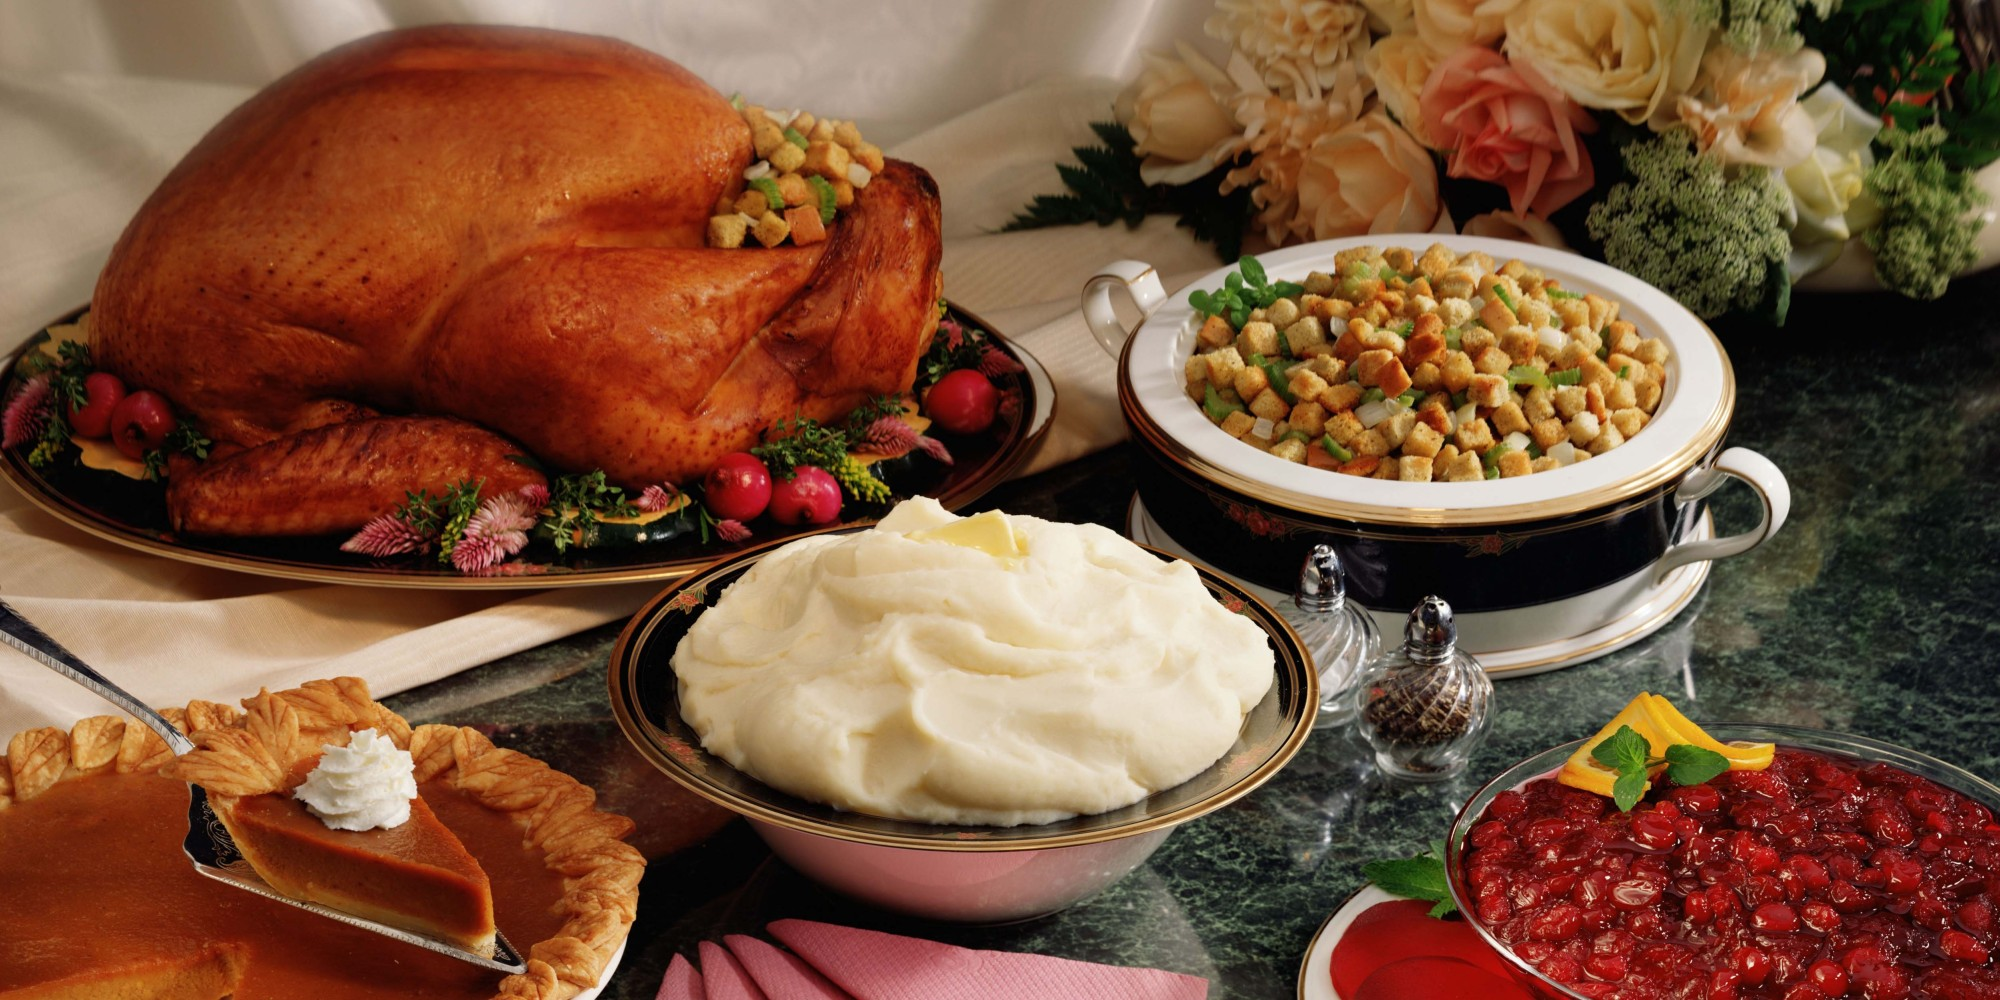 o-CHRISTMAS-PARTY-FOOD-facebook